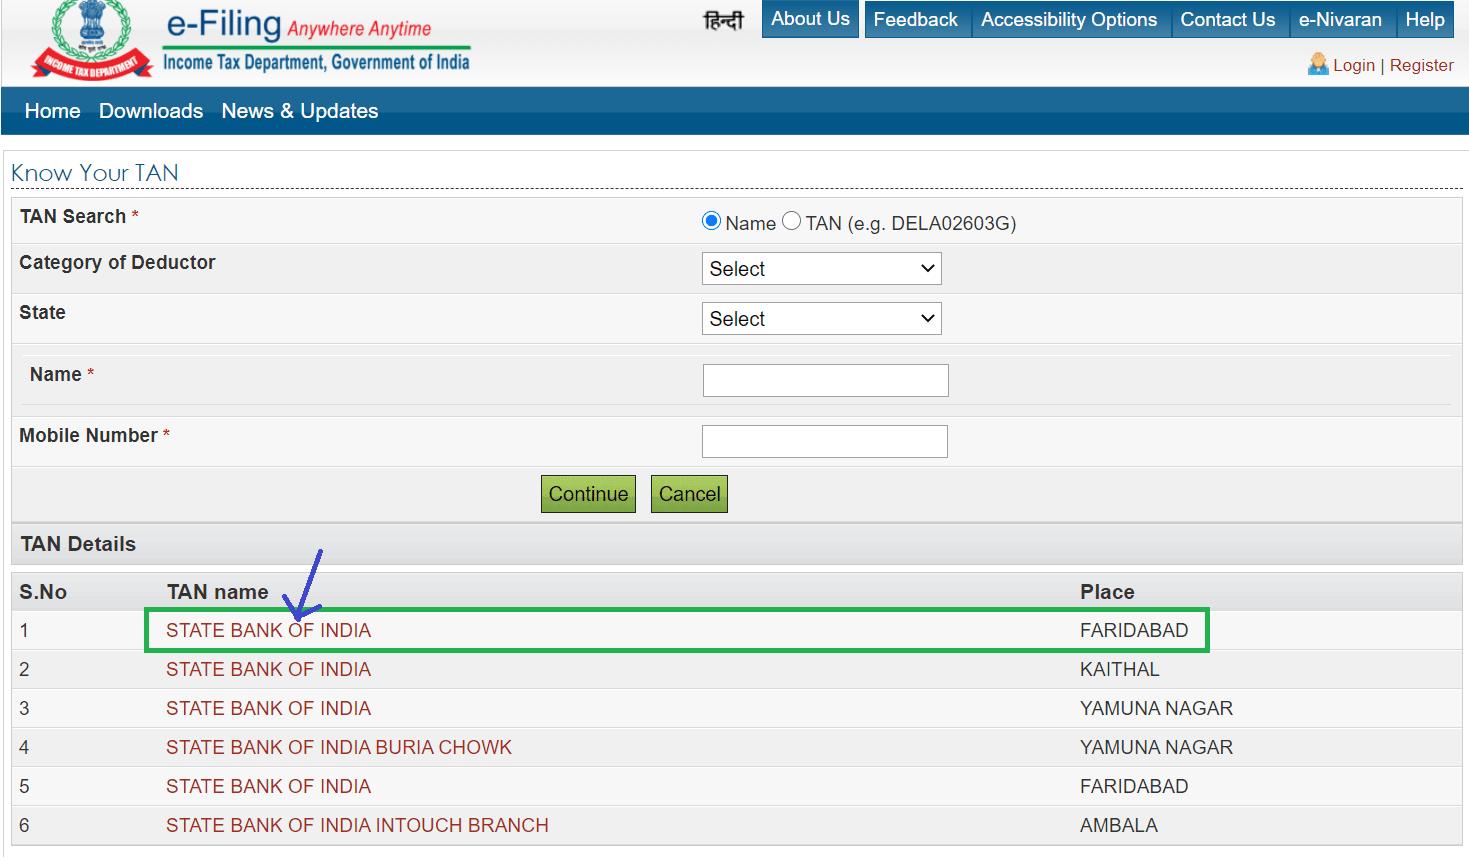 choose sbi branch for tan number